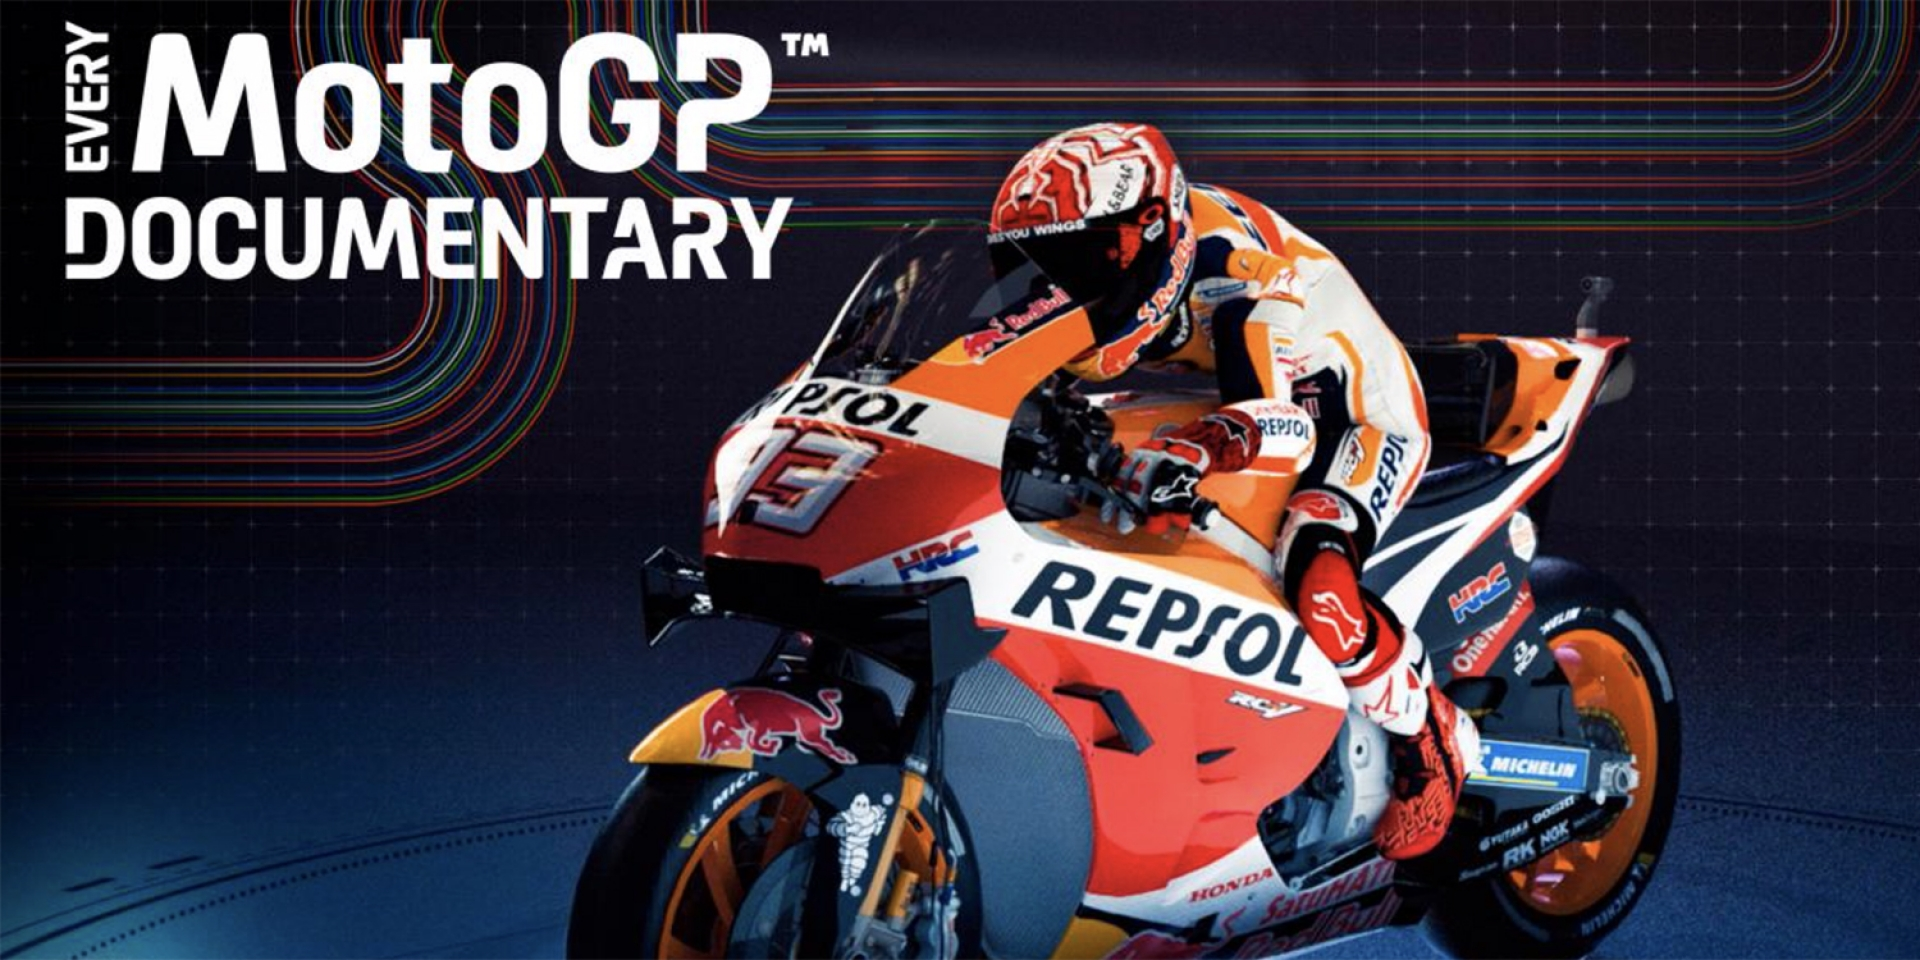 VIDEOPASS免費看?!MotoGP防疫大作戰,四月底前限時大放送